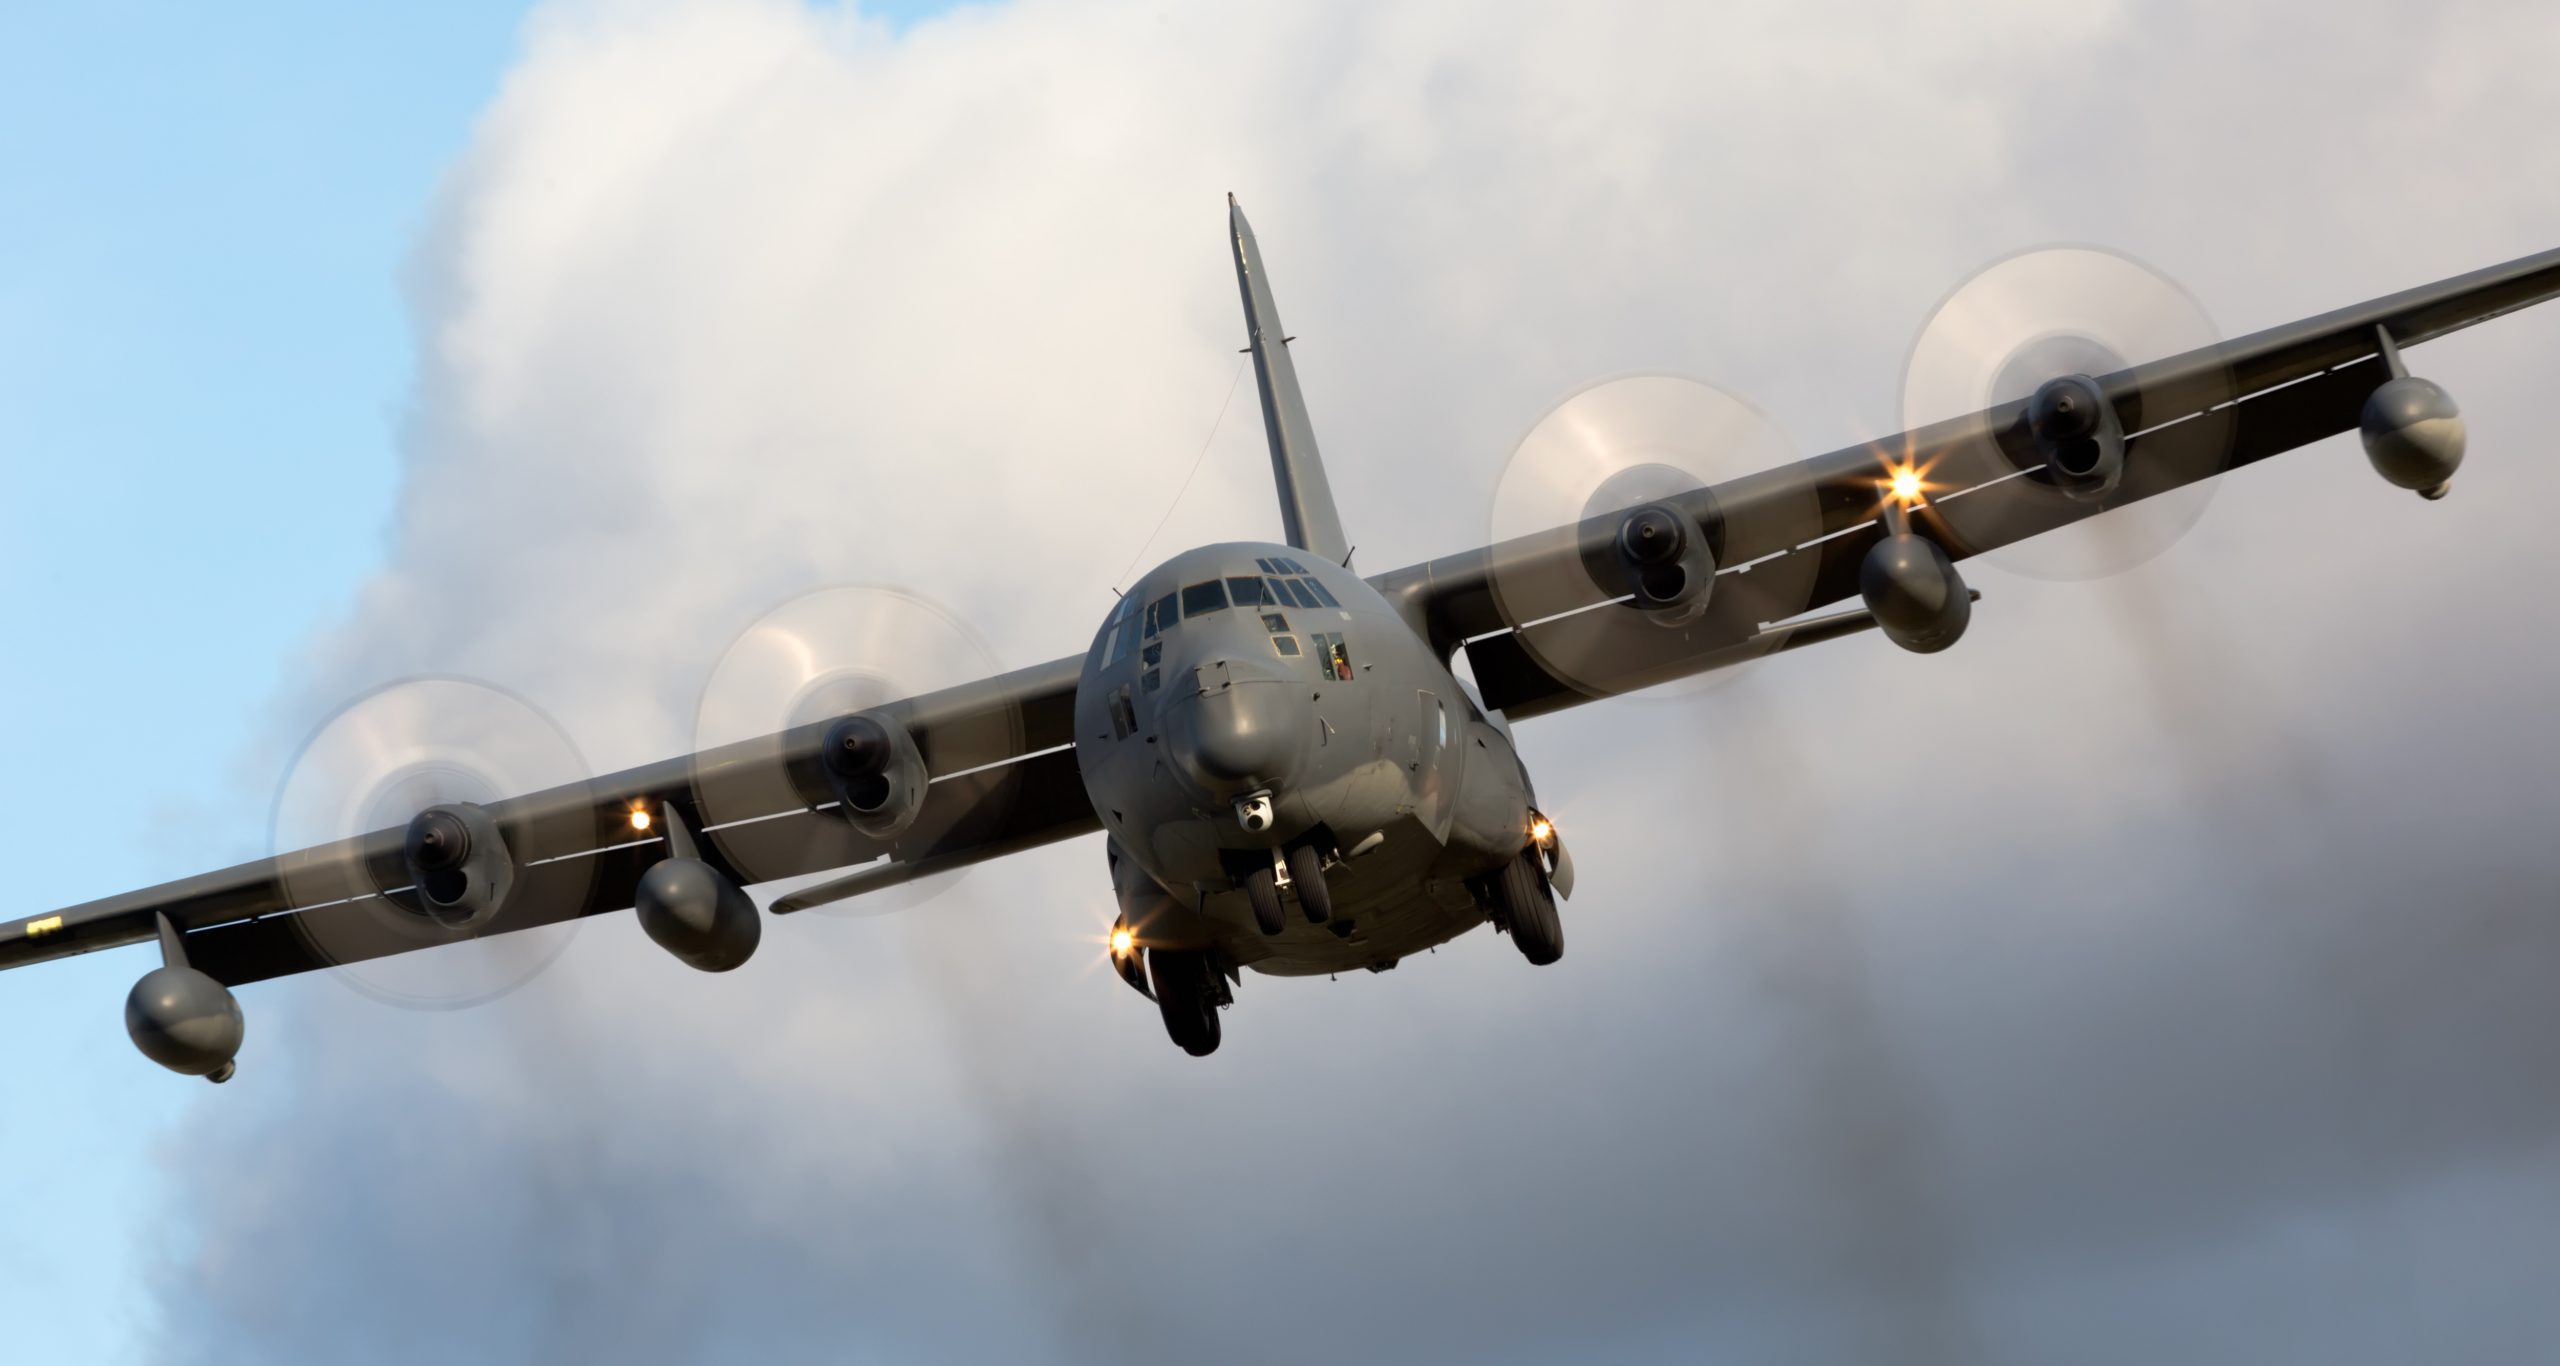 Lockheed MC-130H Hercules with large cloud behind it